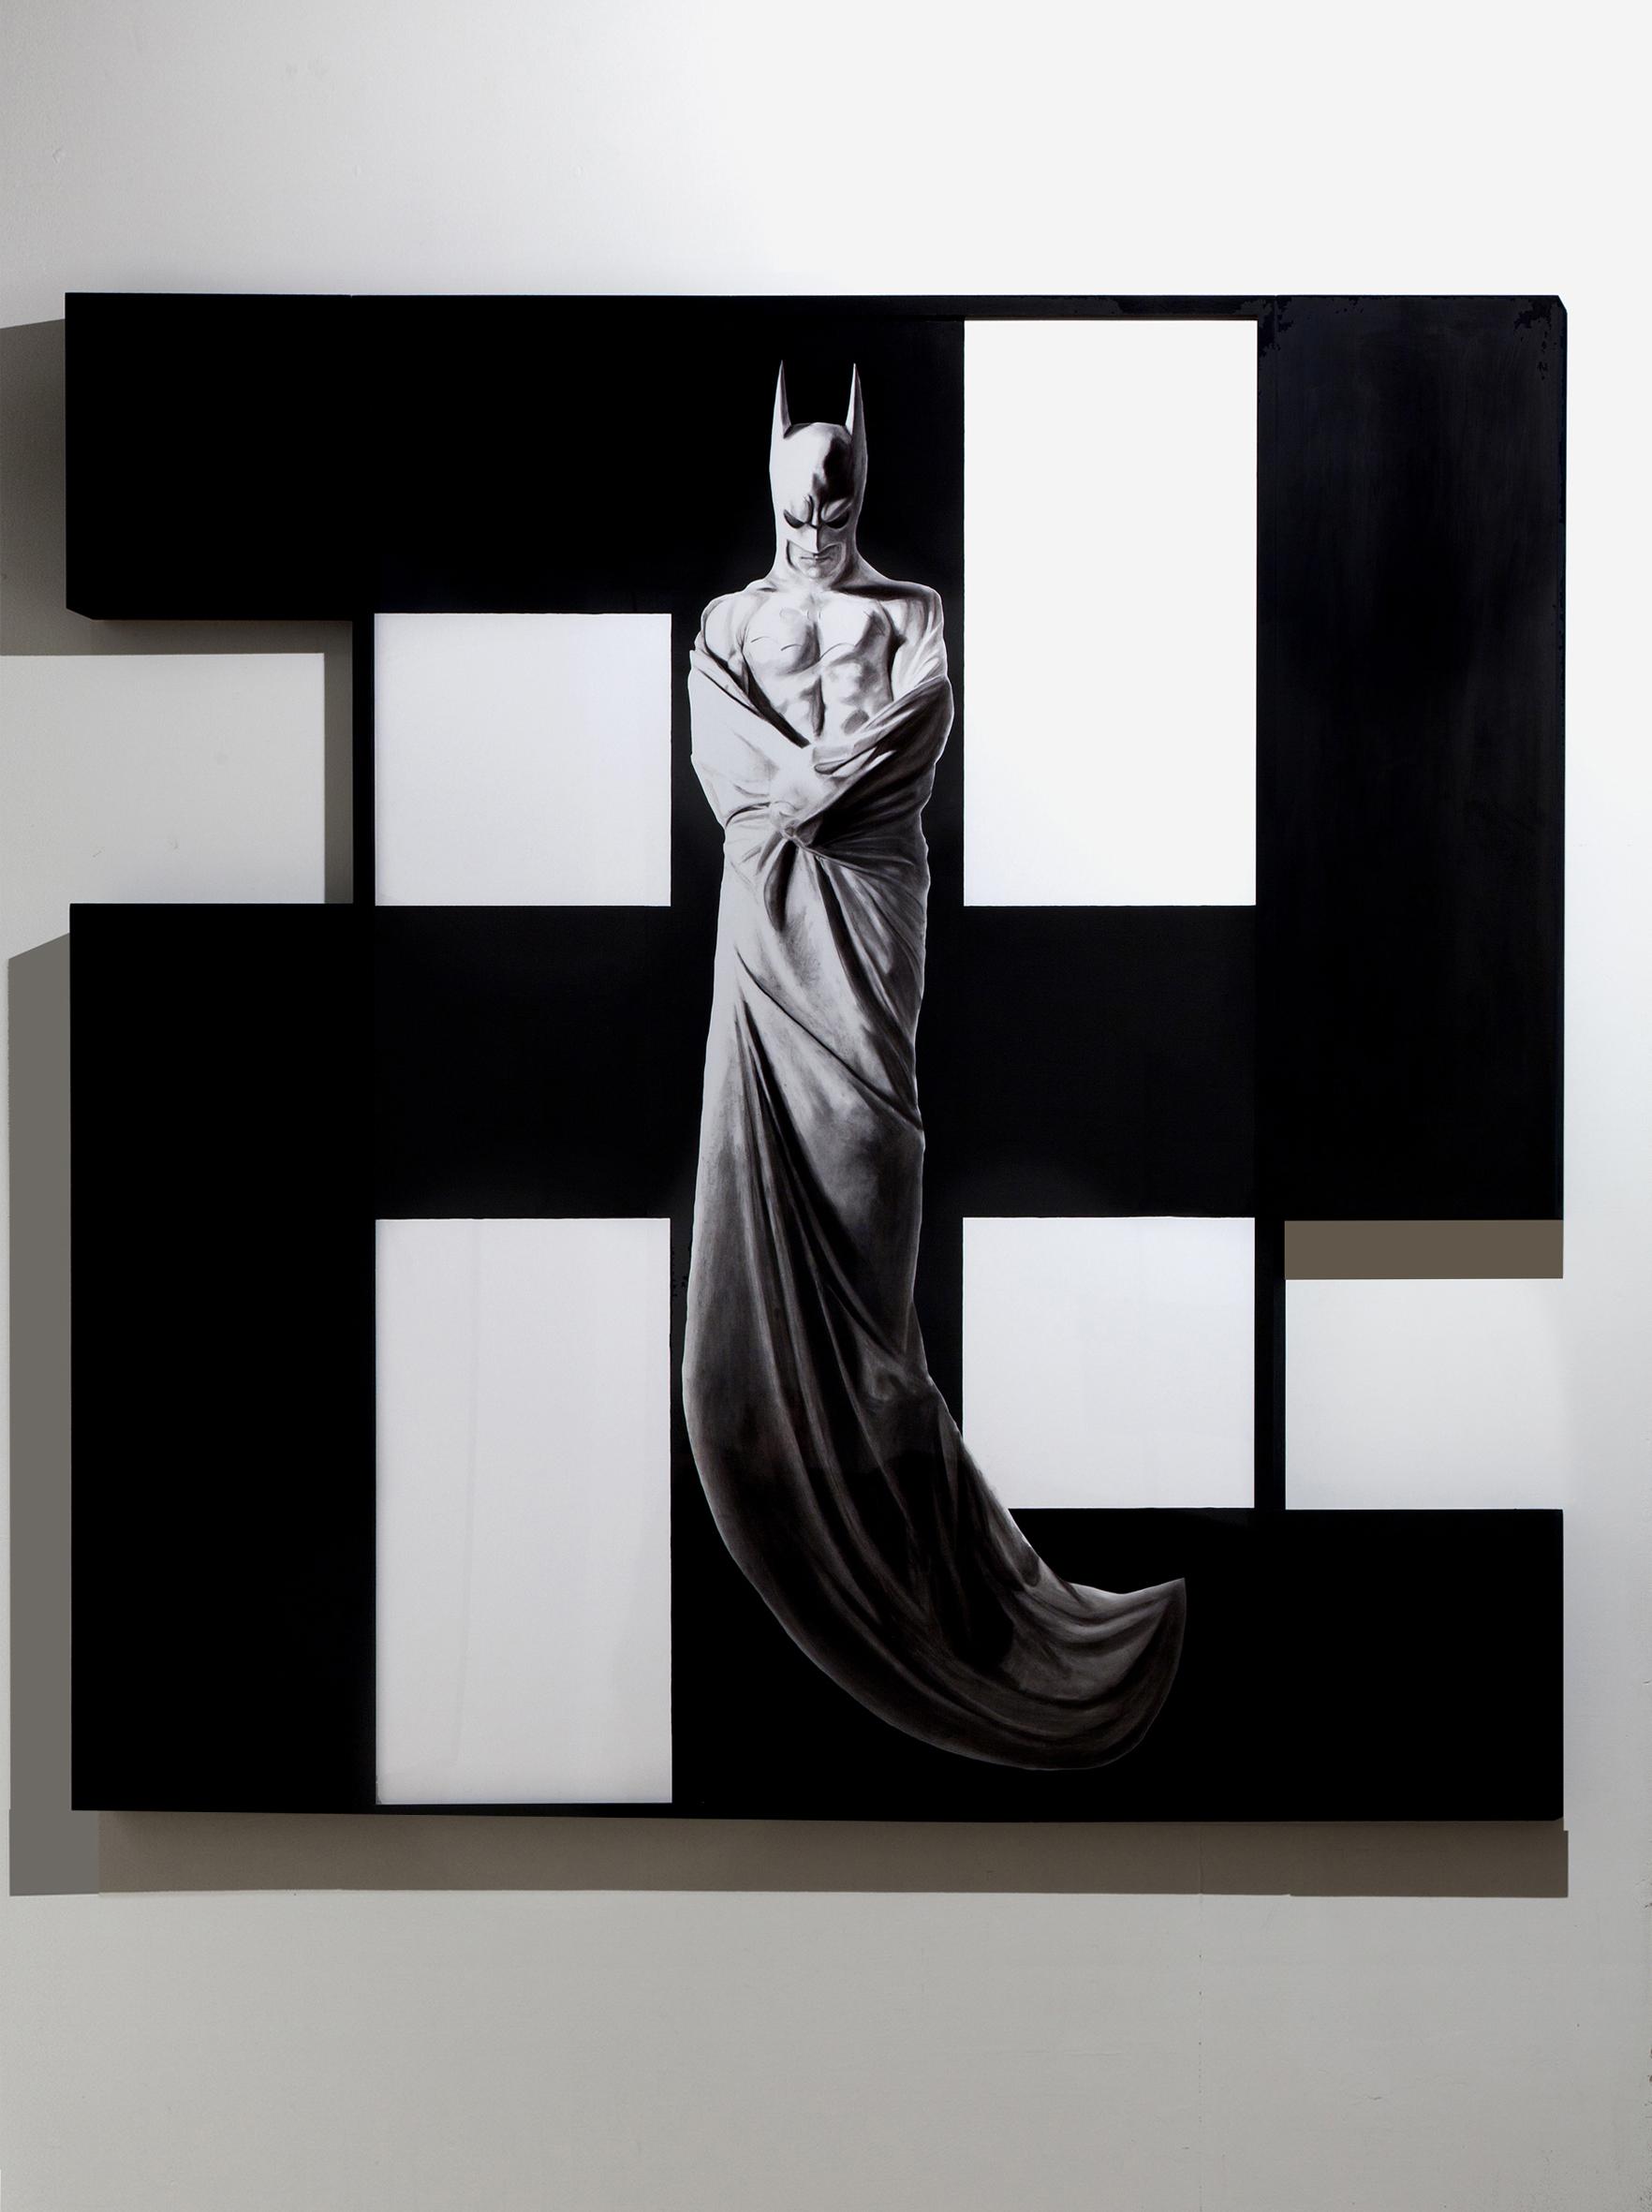 In Excelsis 6 , 2011 . Charcoal, paper, wood, enamel paint, 225 x 232,5x7 cm. Photo: Claudio Abate